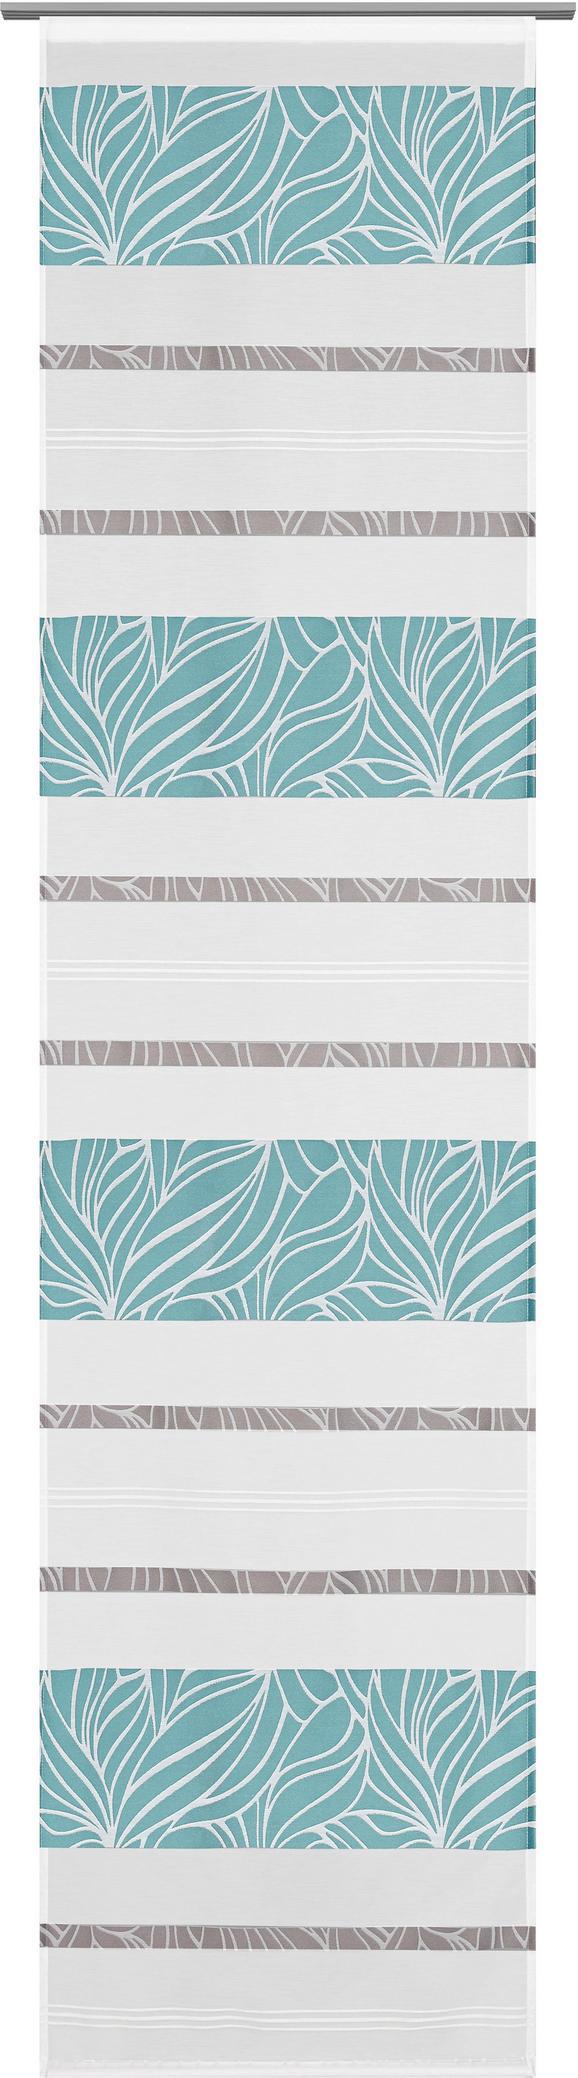 Panelna Zavesa Anita - modra, Konvencionalno, tekstil (60/245cm) - Modern Living